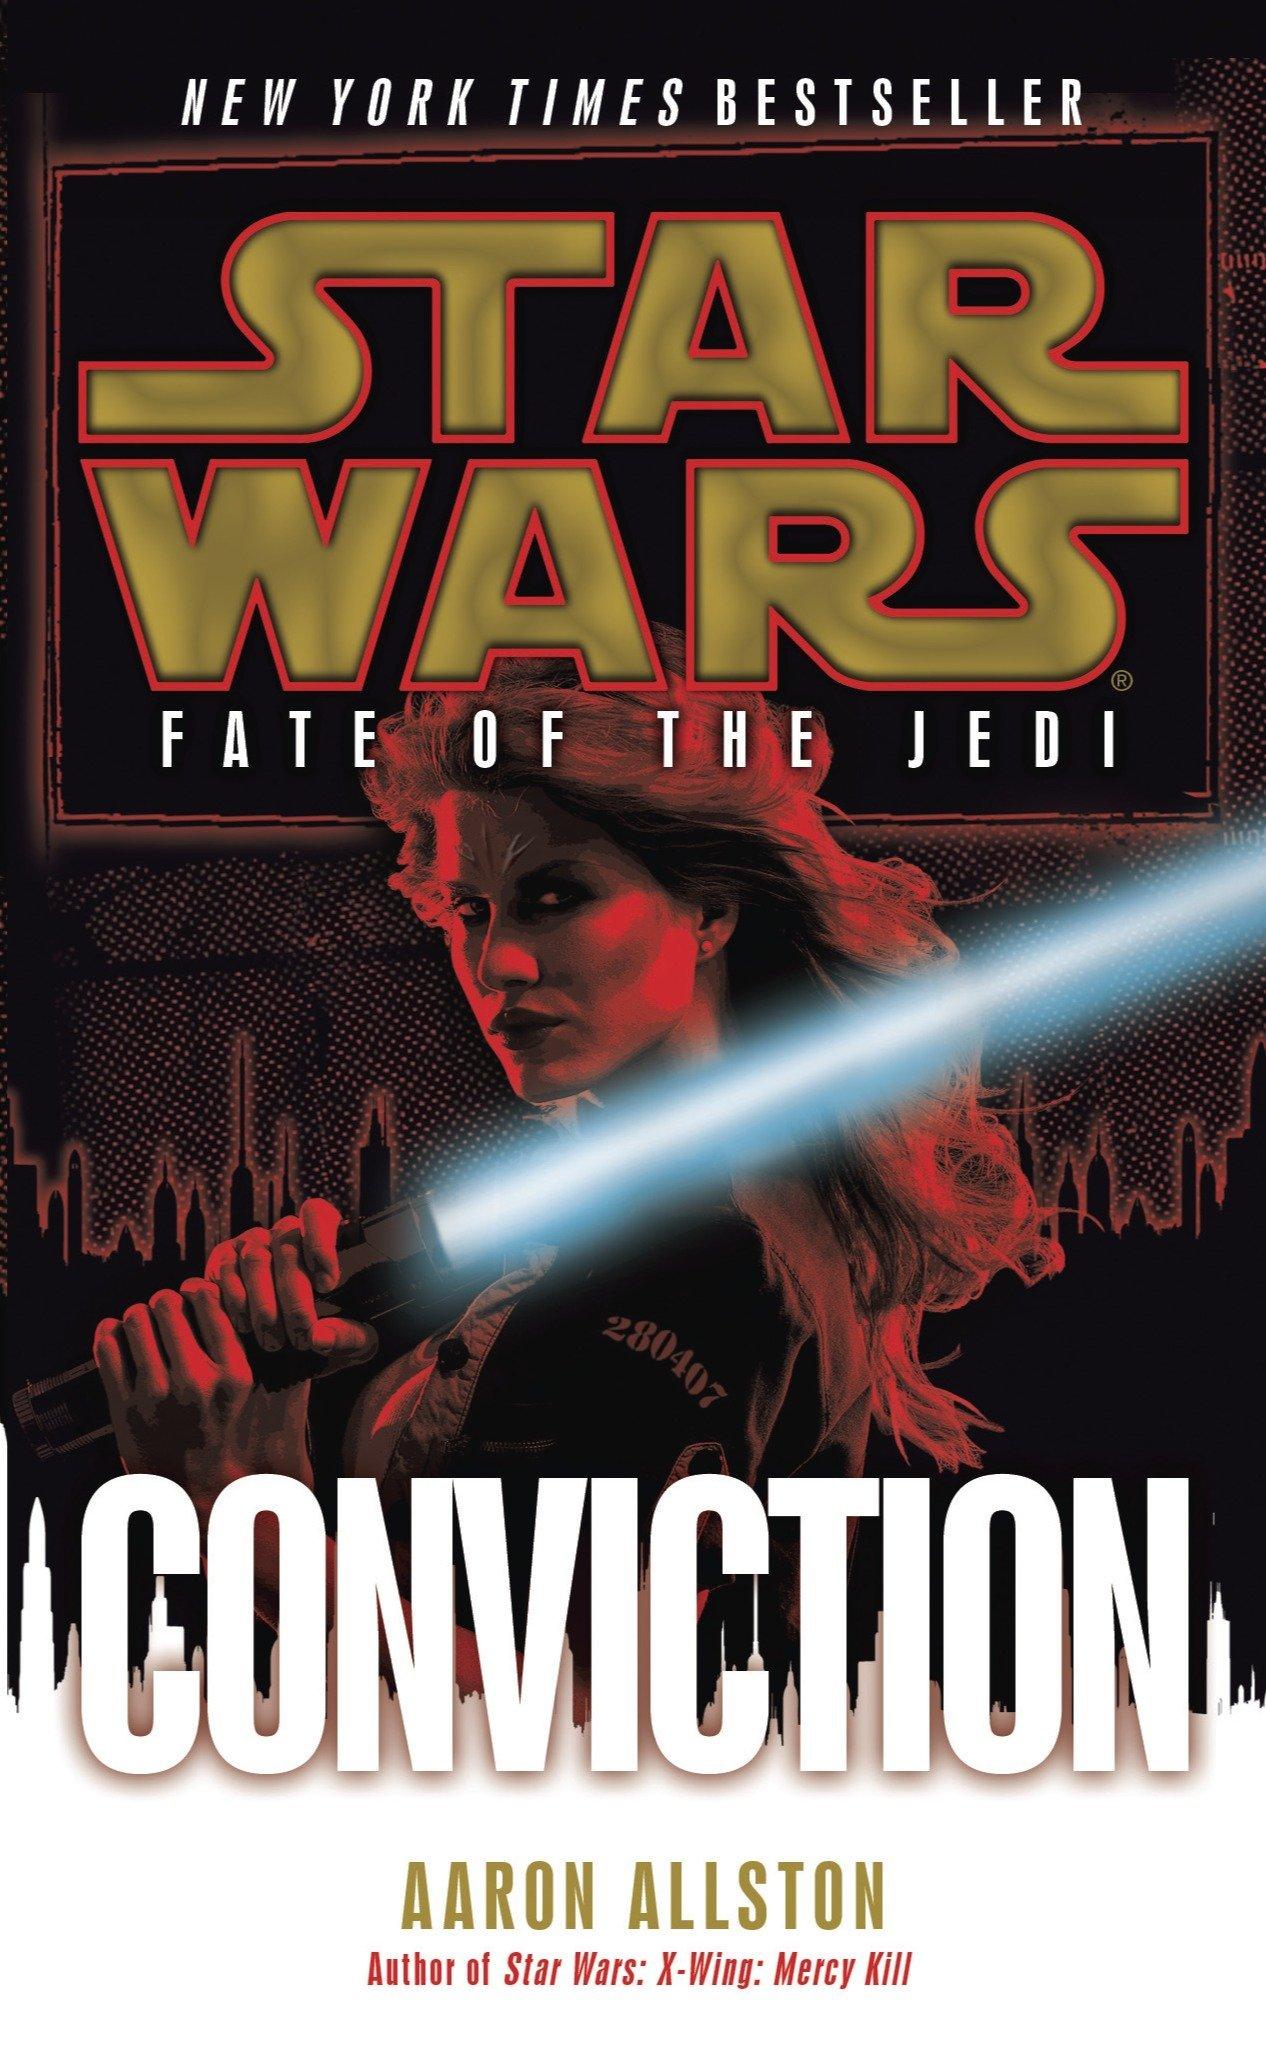 Conviction: Star Wars Legends (Fate of the Jedi) (Star Wars: Fate of the Jedi - Legends, Band 7)